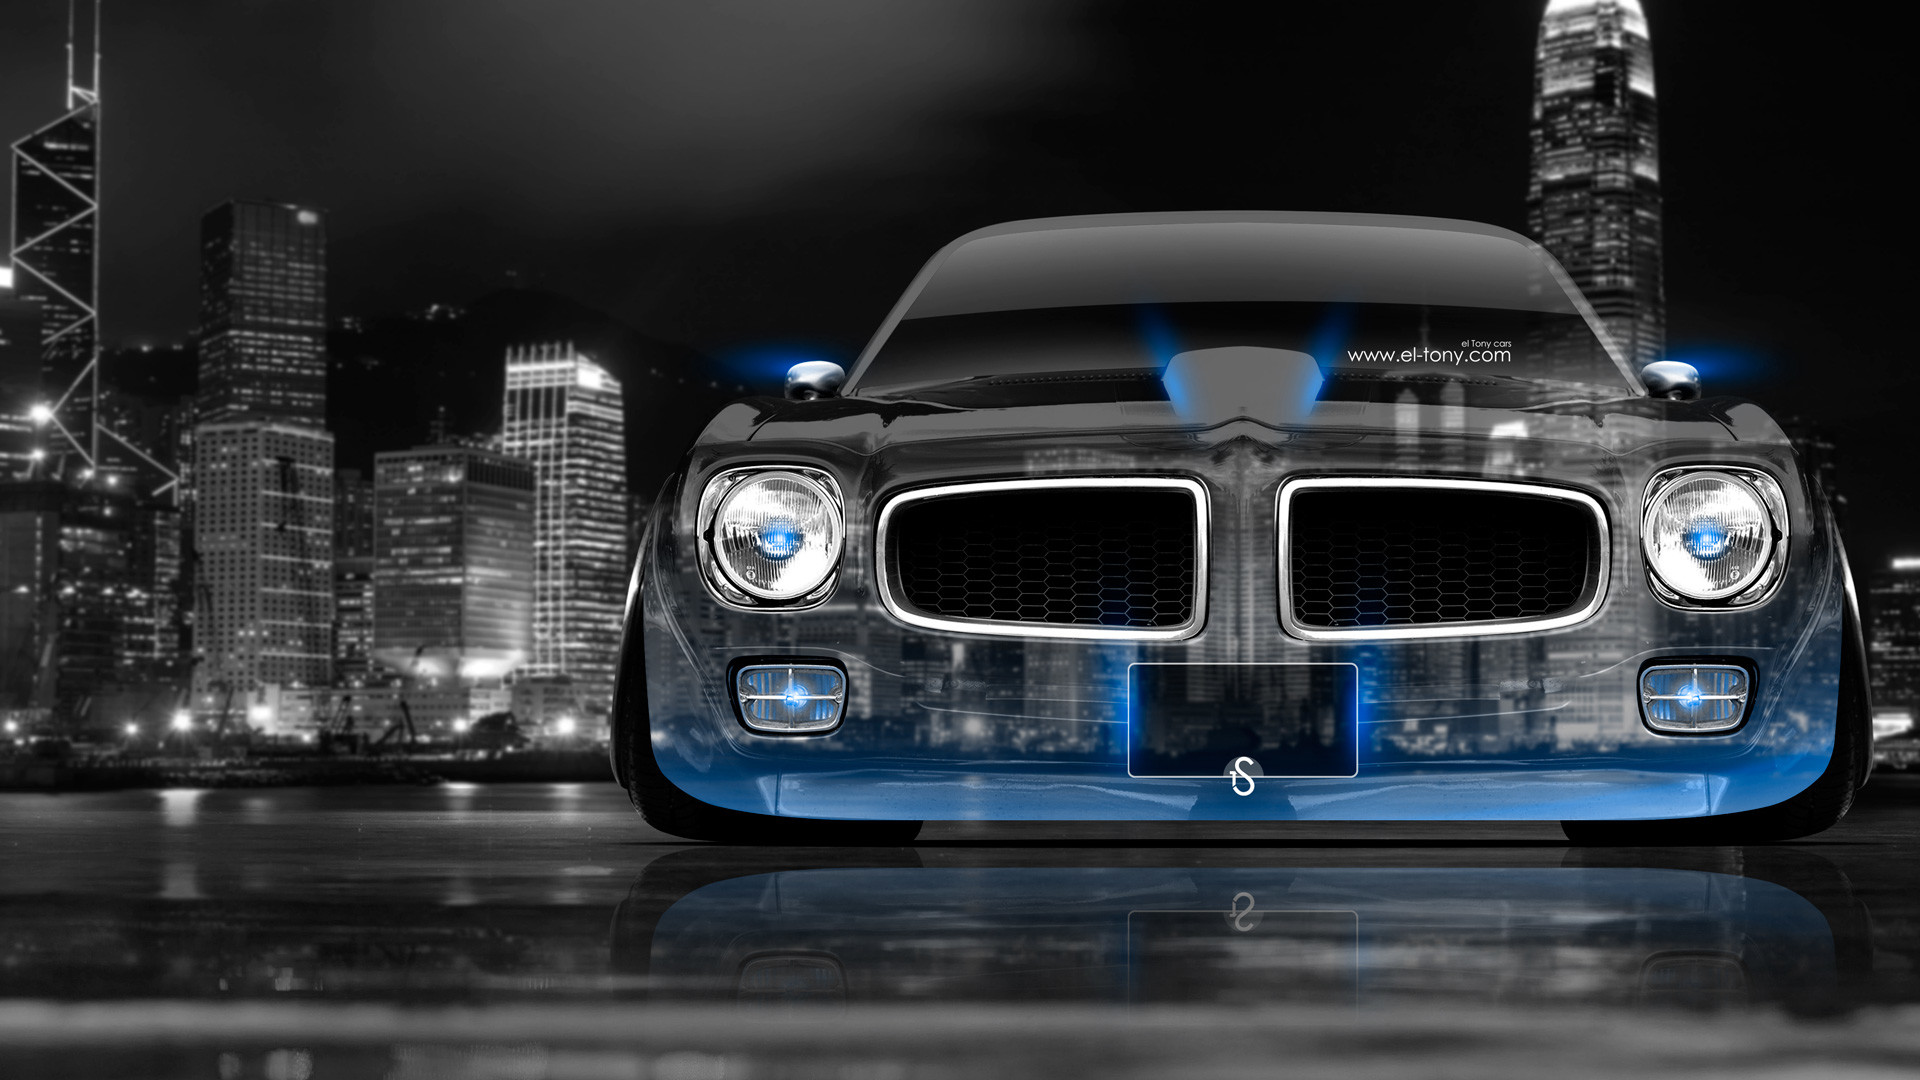 … Pontiac-Firebird-Front-Crystal-City-Car-2014-Blue-